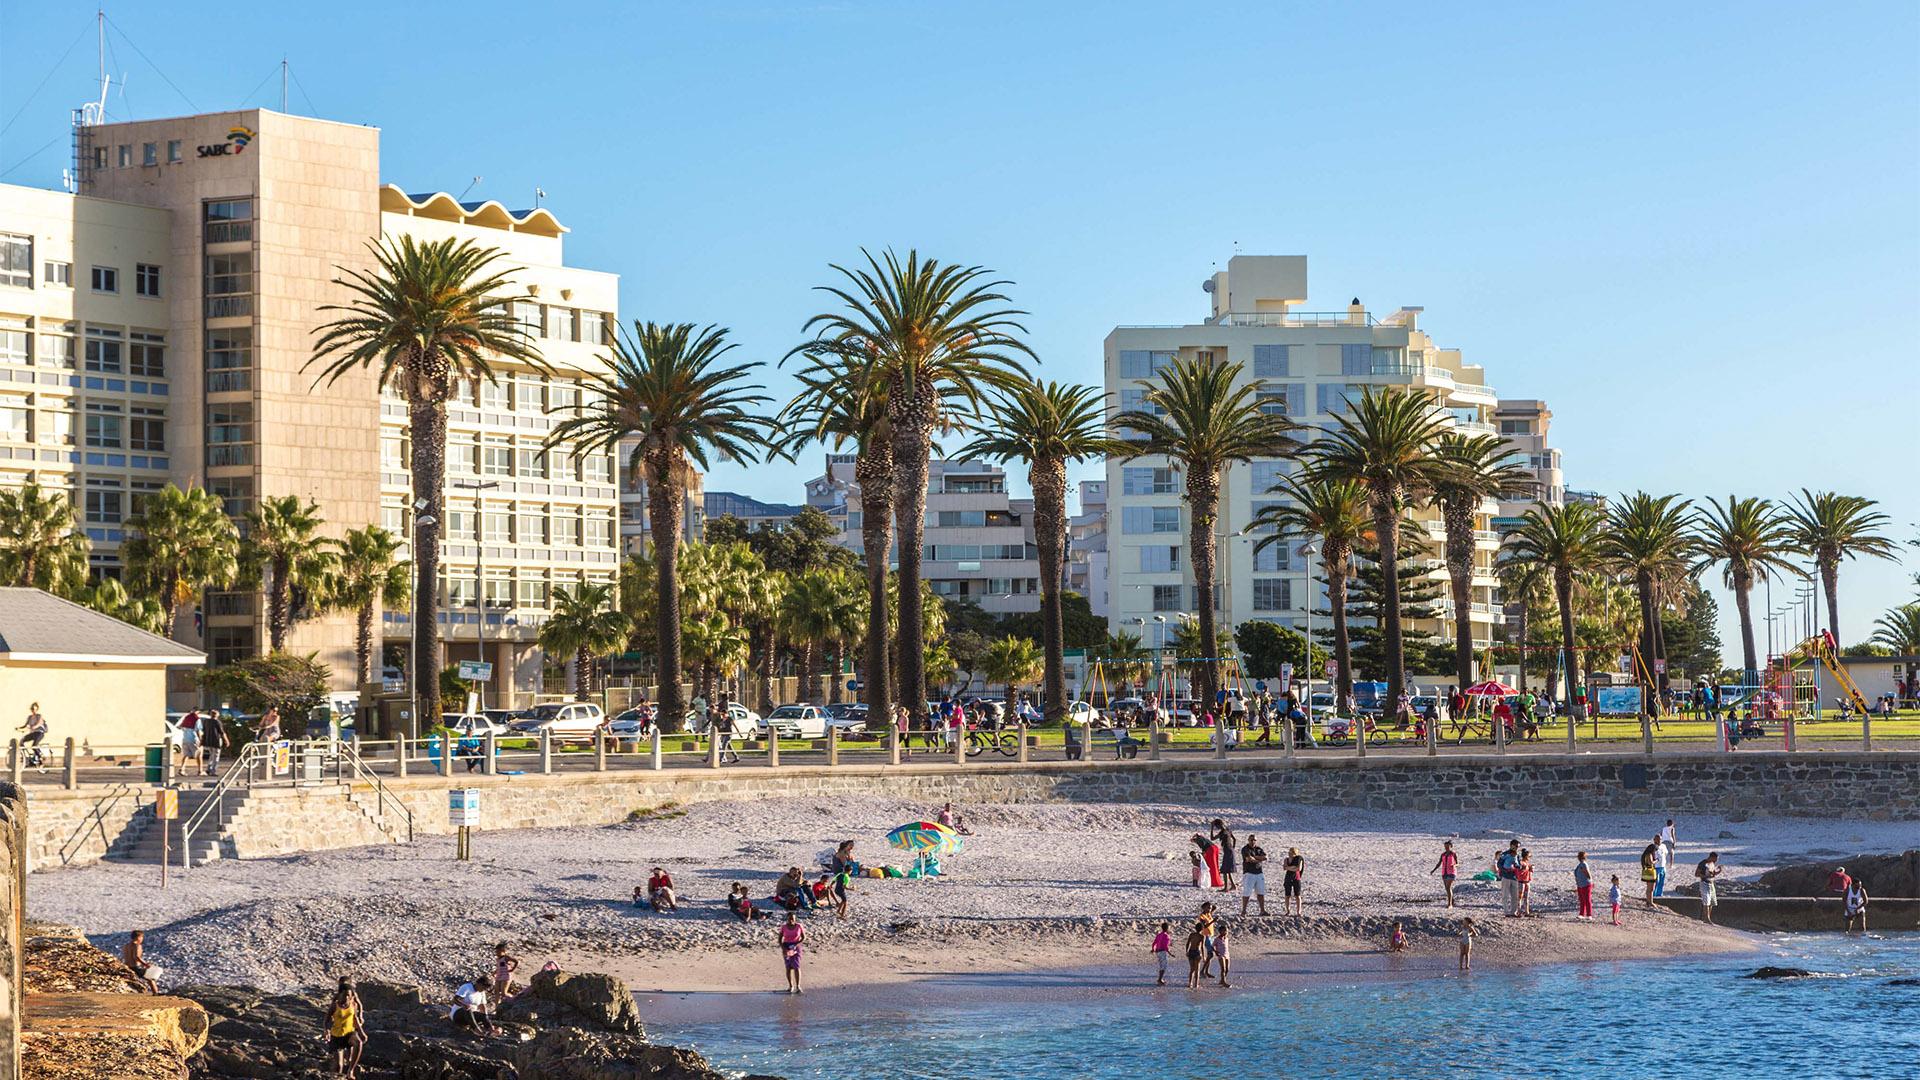 sea-point-holiday-rentals-main-image